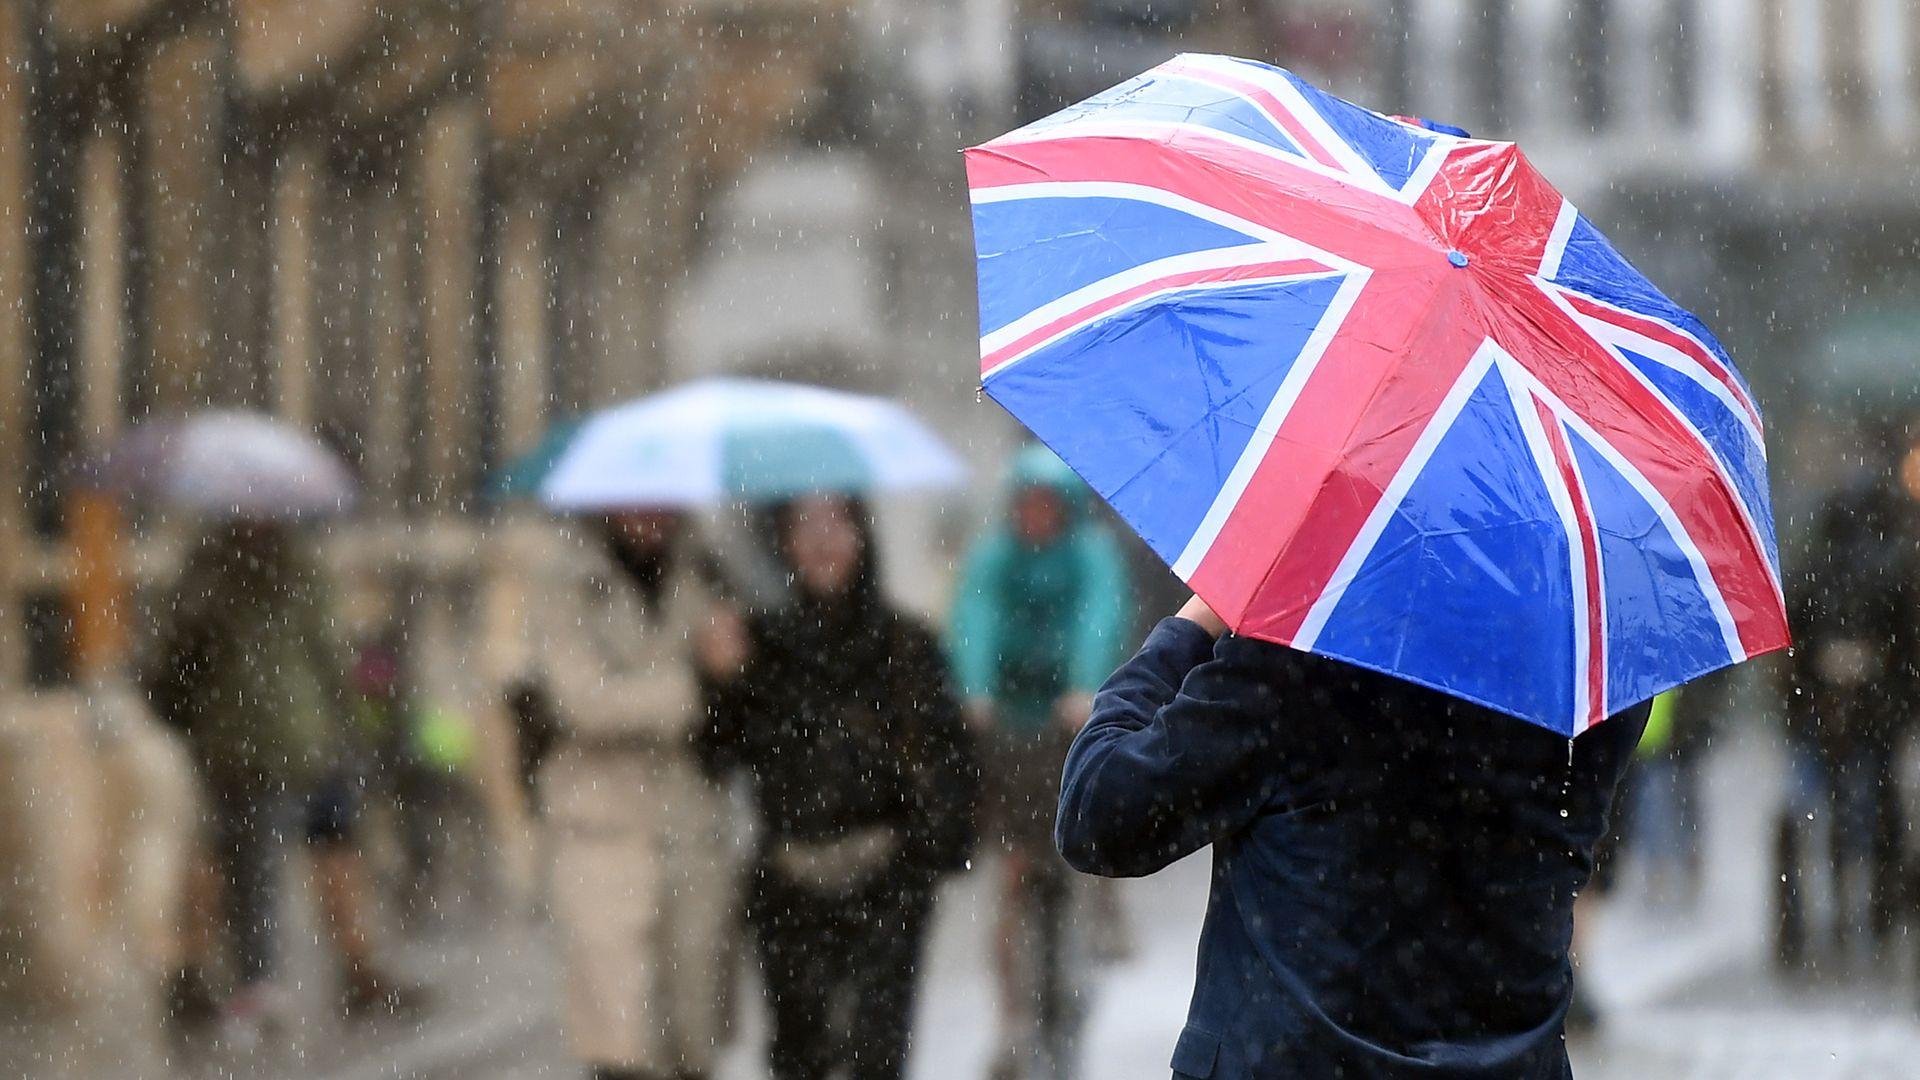 A man carries a Union flag umbrella - Credit: PA